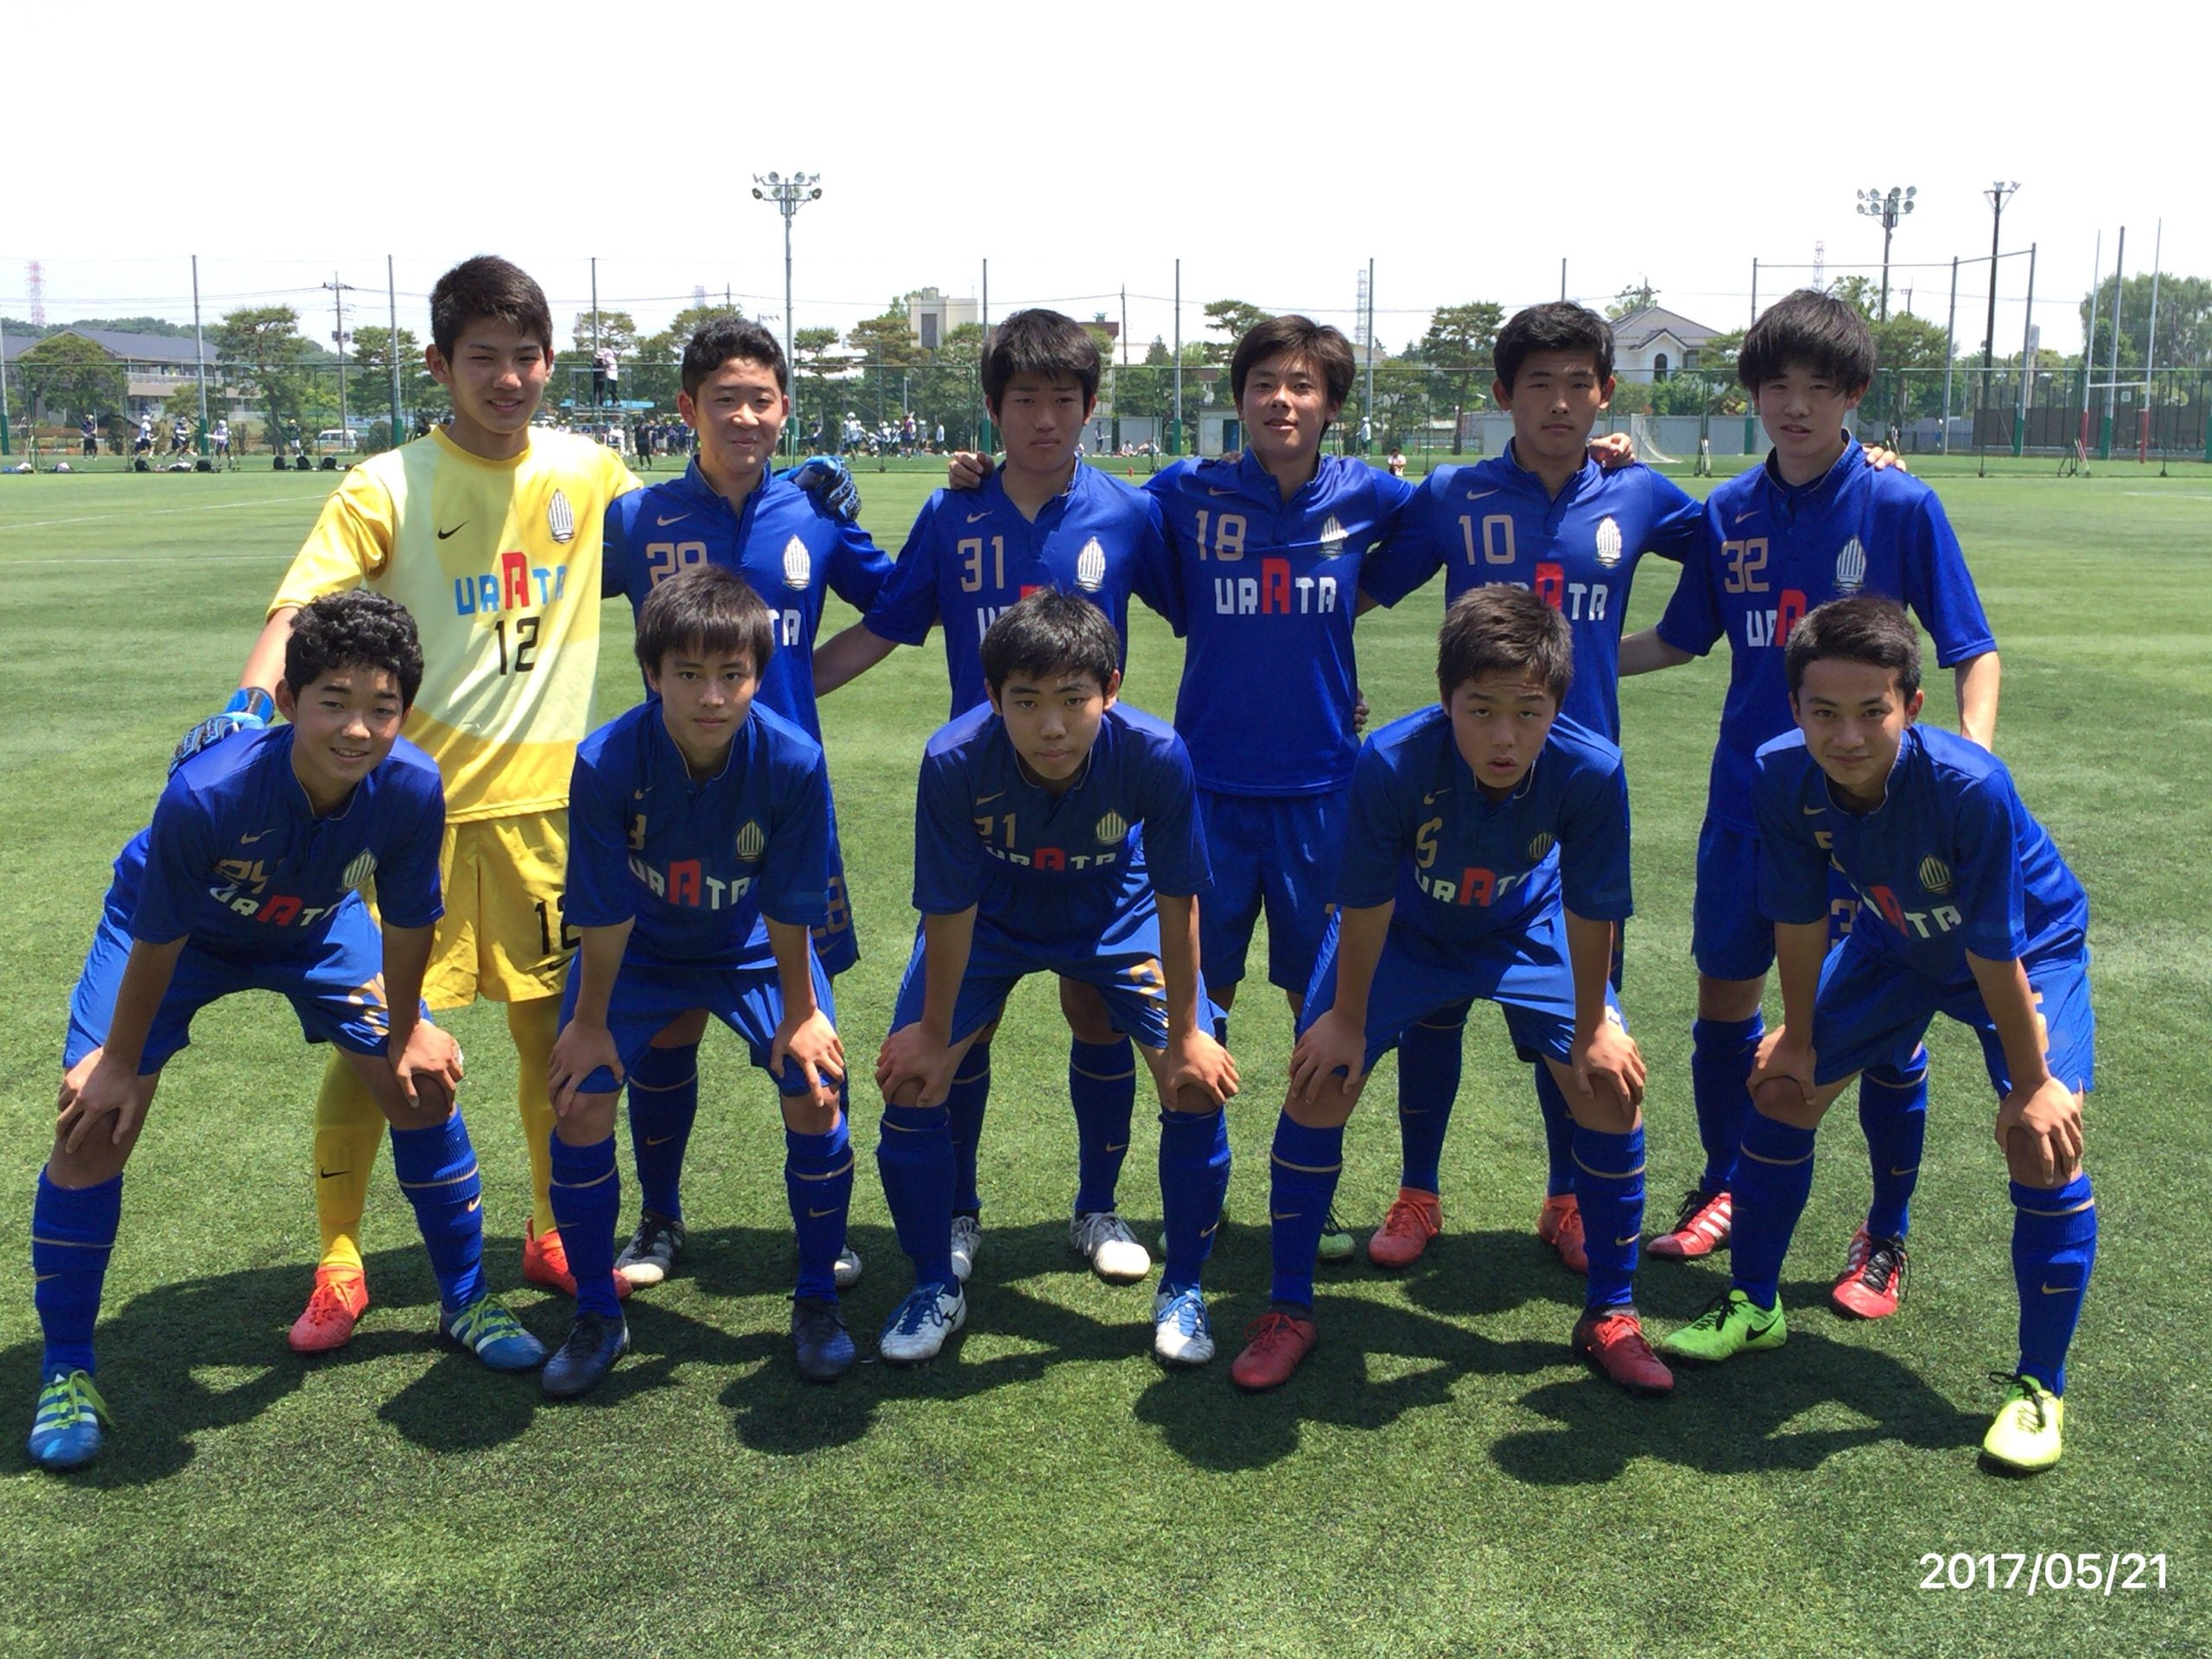 【U18】第 41 回 日本クラブユースサッカー選手権(U-18)関東大会ノックアウトステージ結果